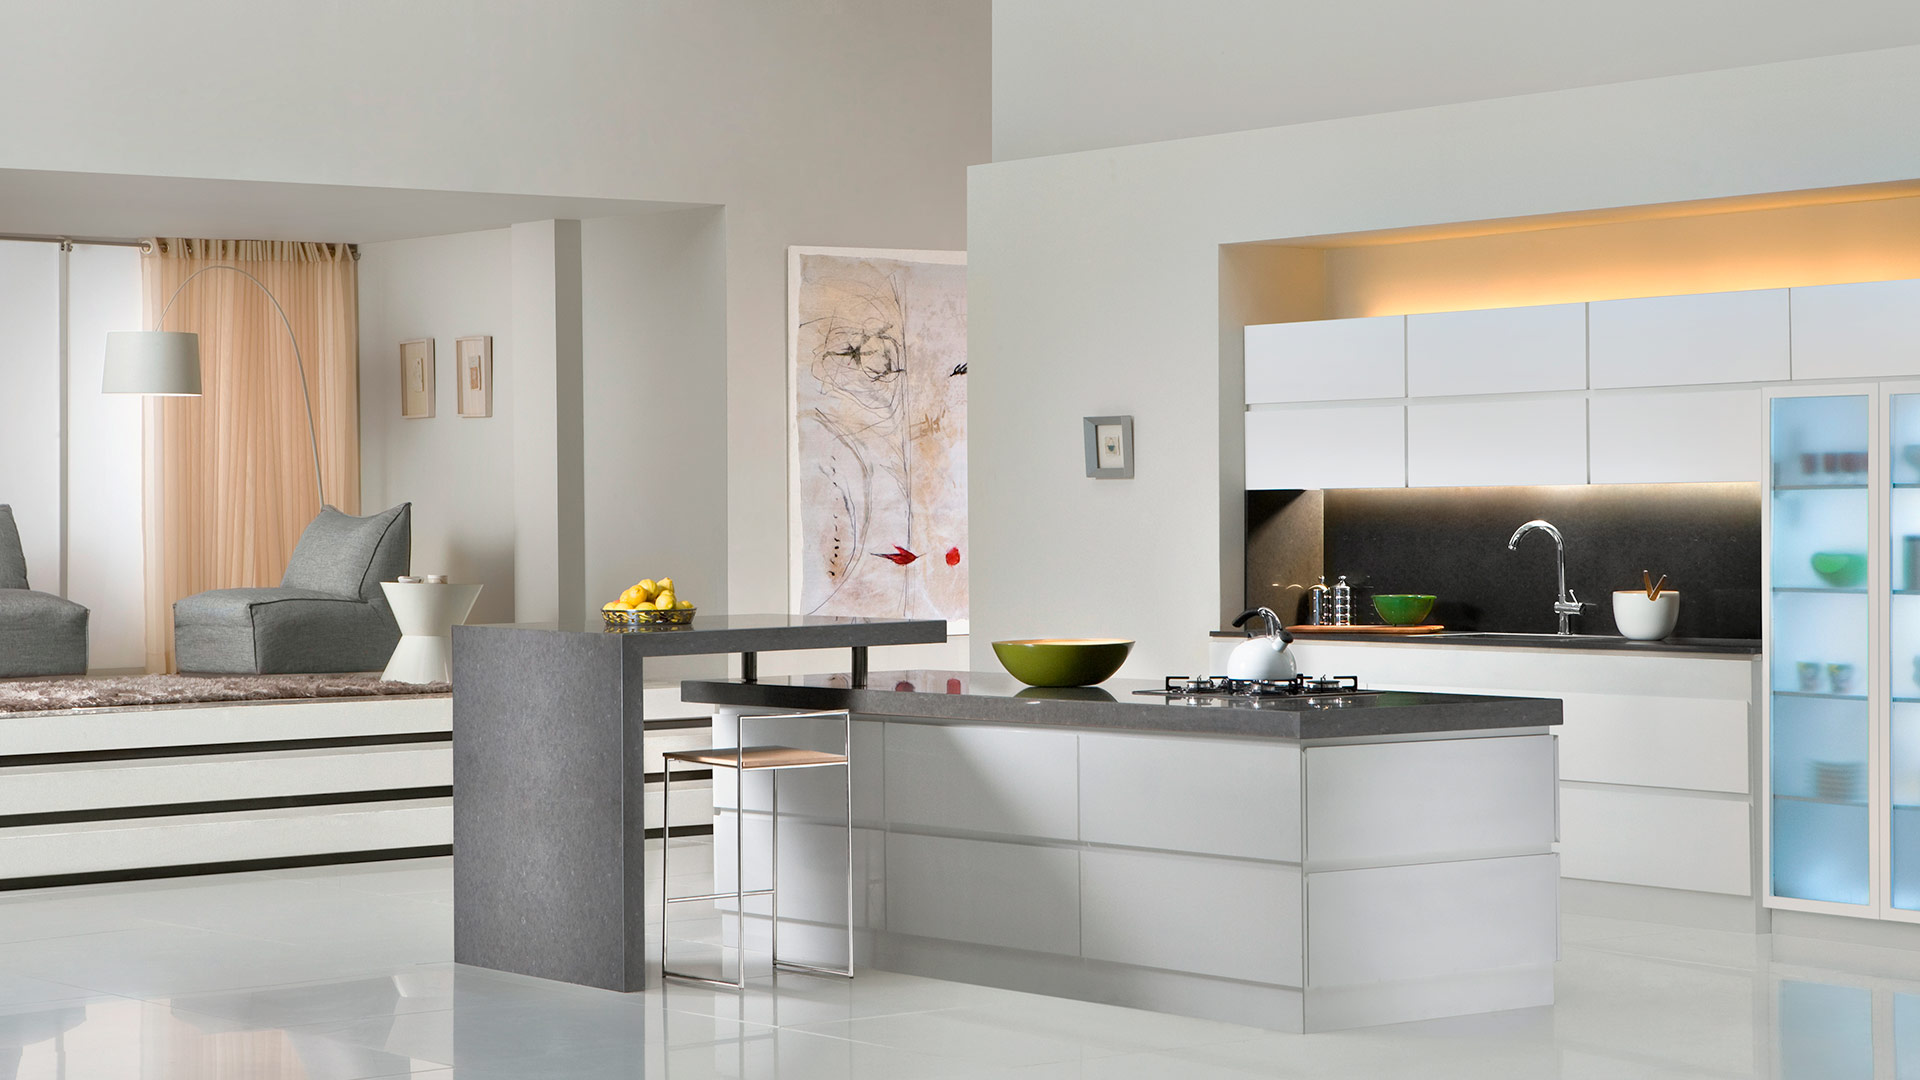 4120_Raven_-kitchen_FIxed-1920X1080